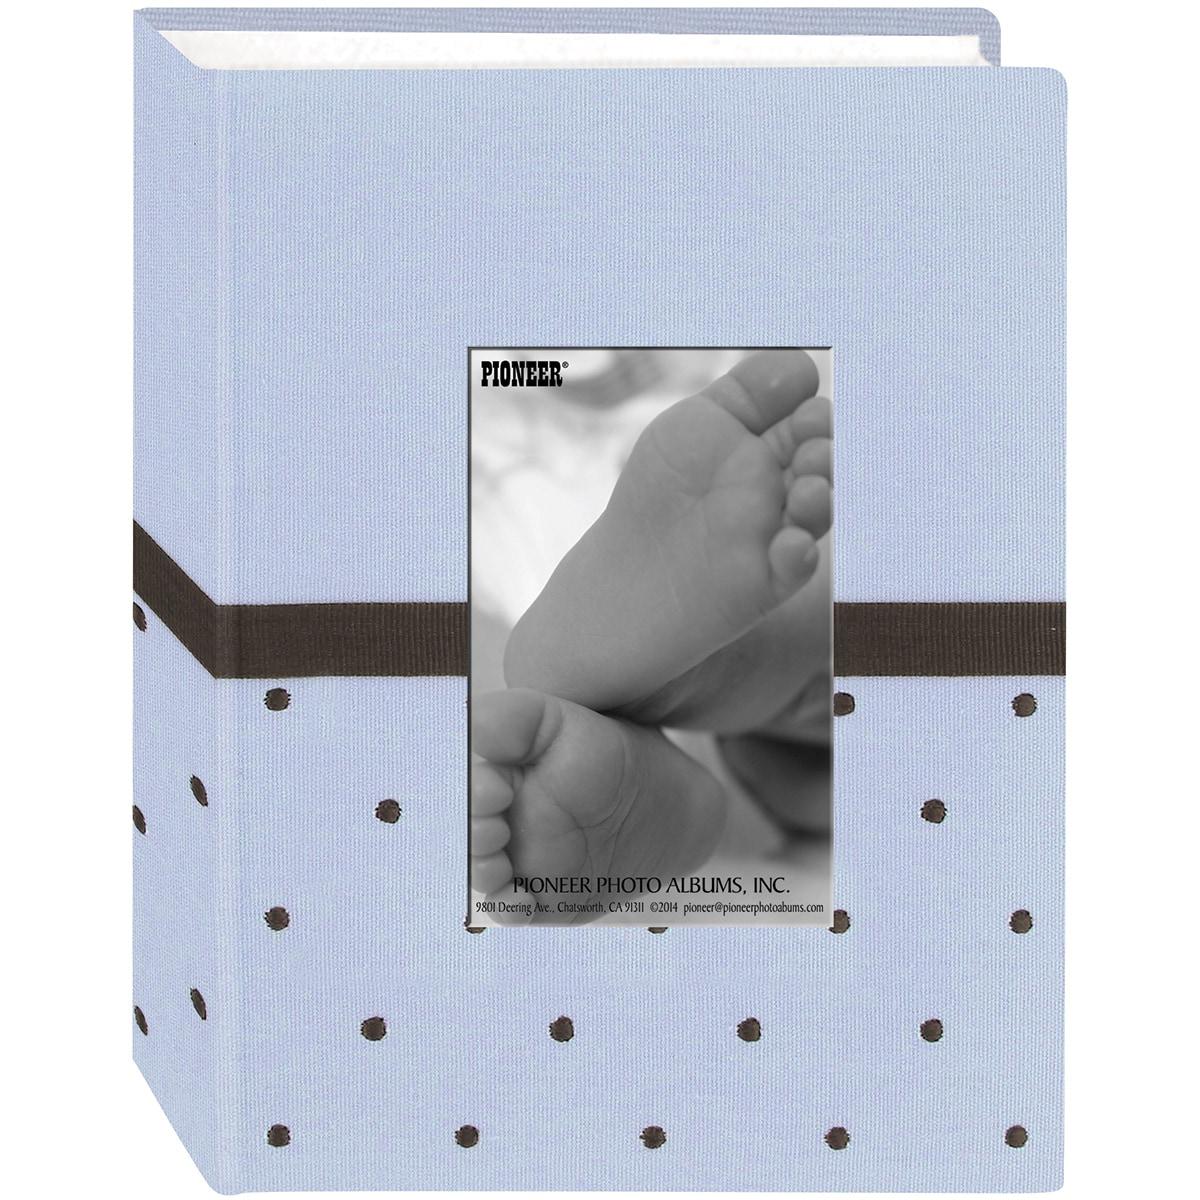 Pioneer Photo Albums Pioneer Dot Fabric Frame 4inX6in Pho...